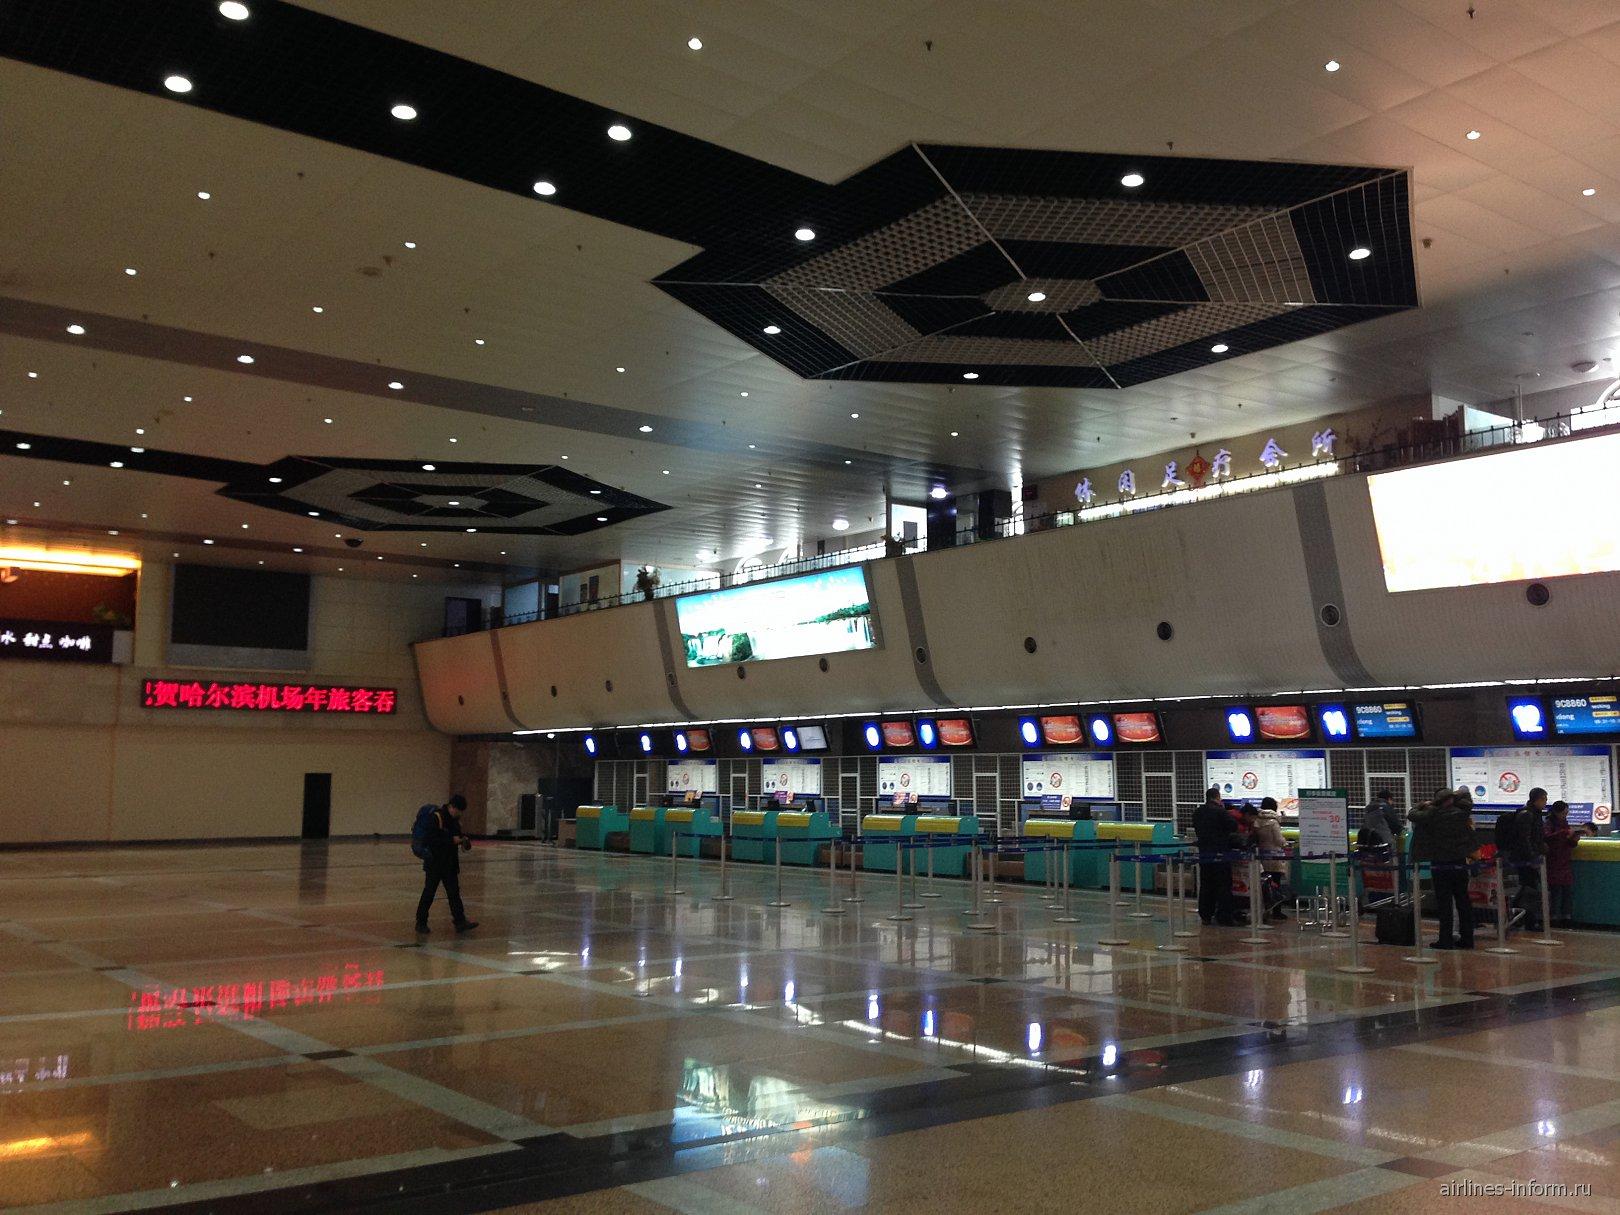 Стойки регистрации в аэропорту Харбин Тайпин